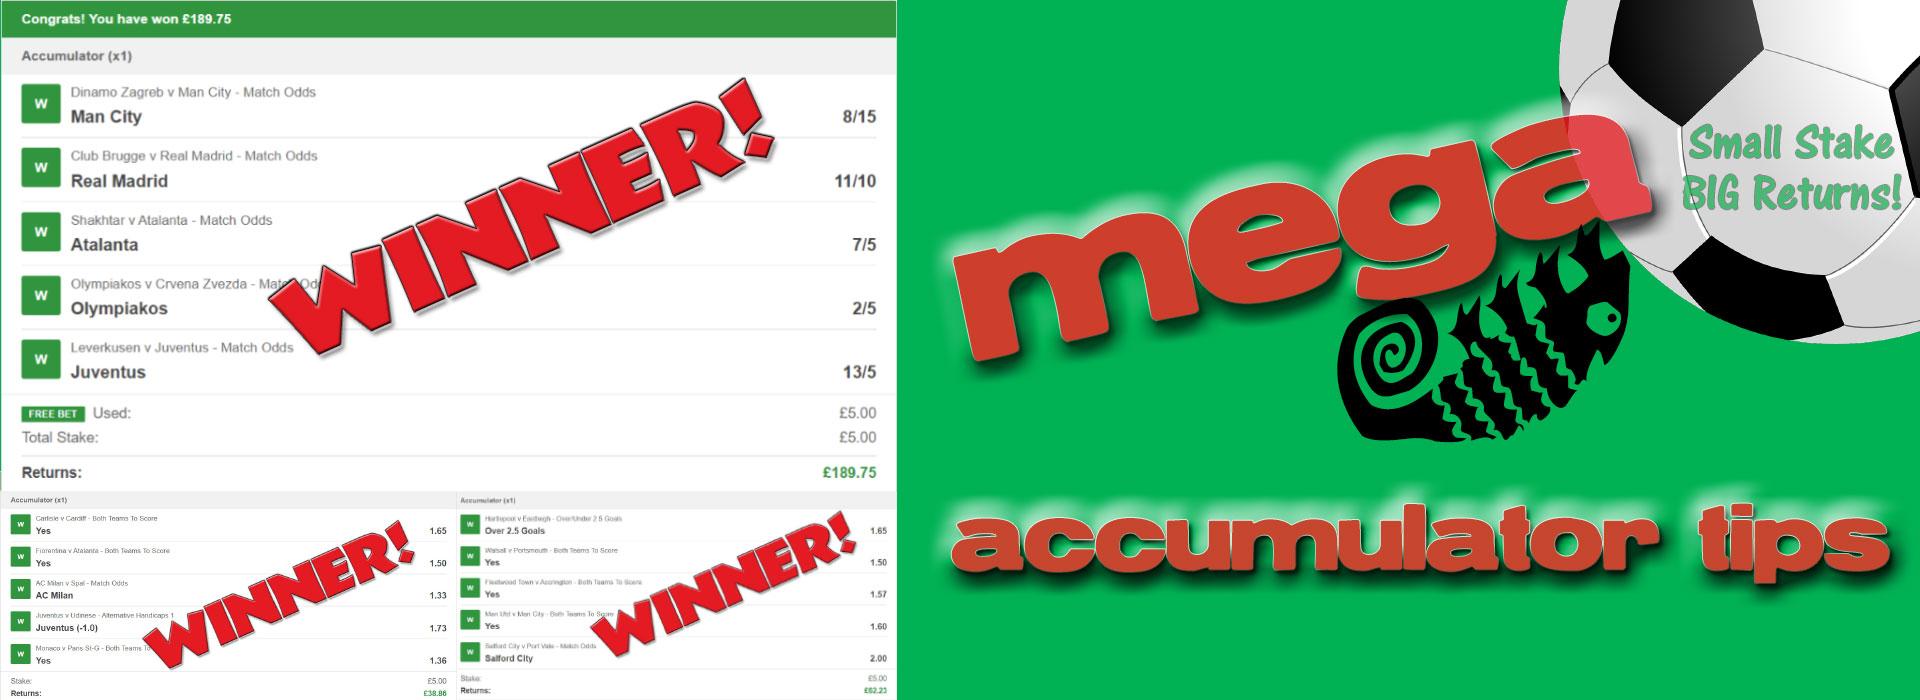 accumulator tips sports betting